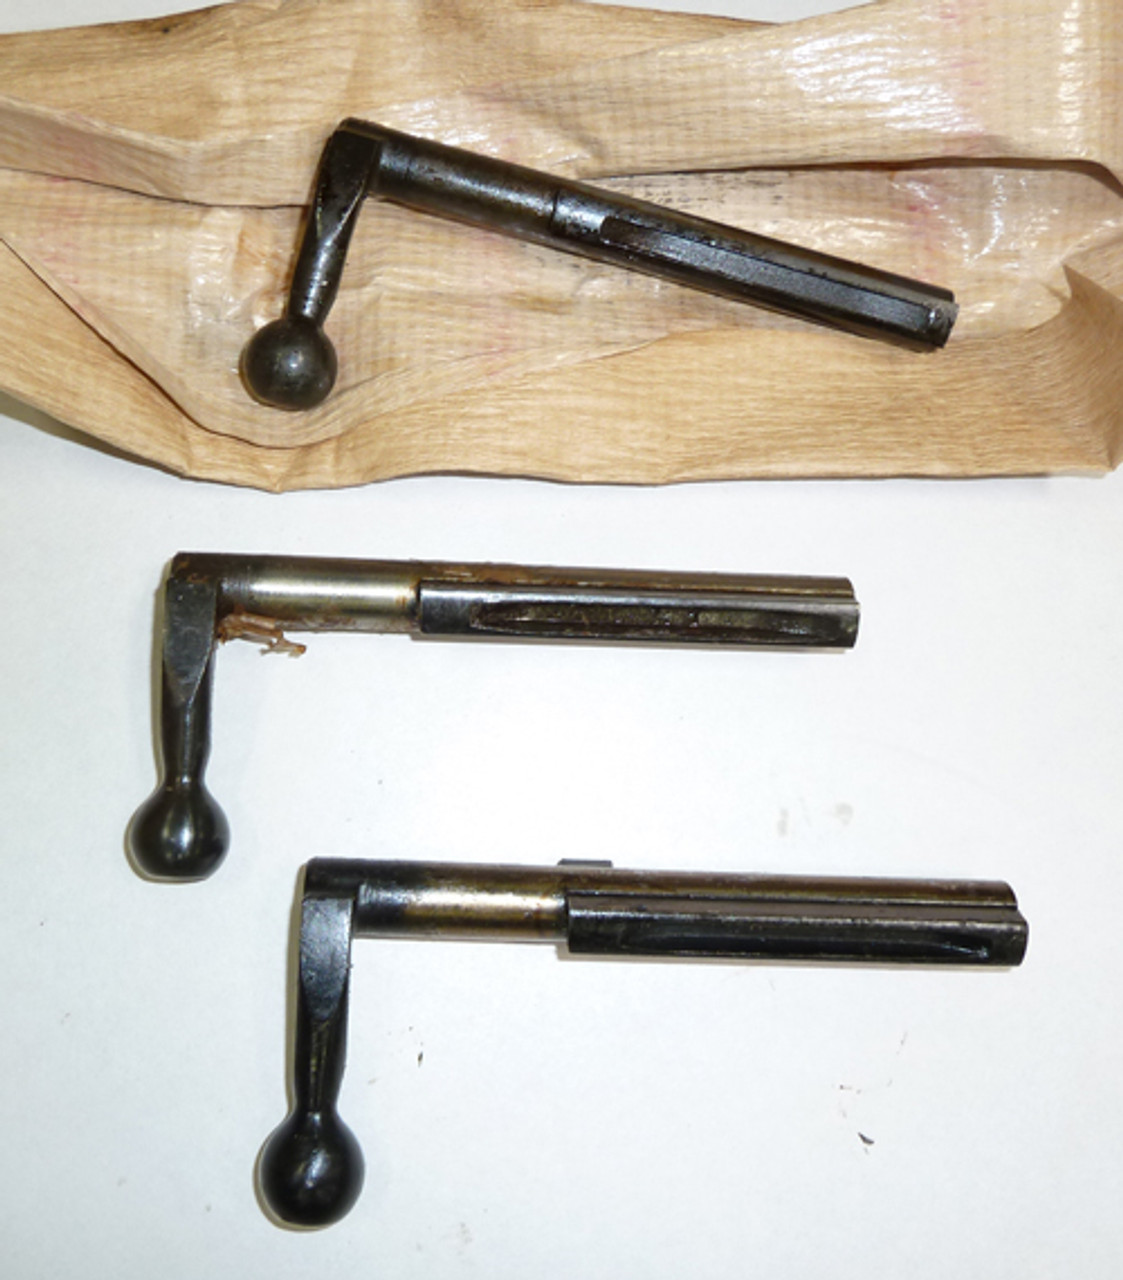 60 BOLT Body, No4 Mk1 - Used,  first variation - solid knob